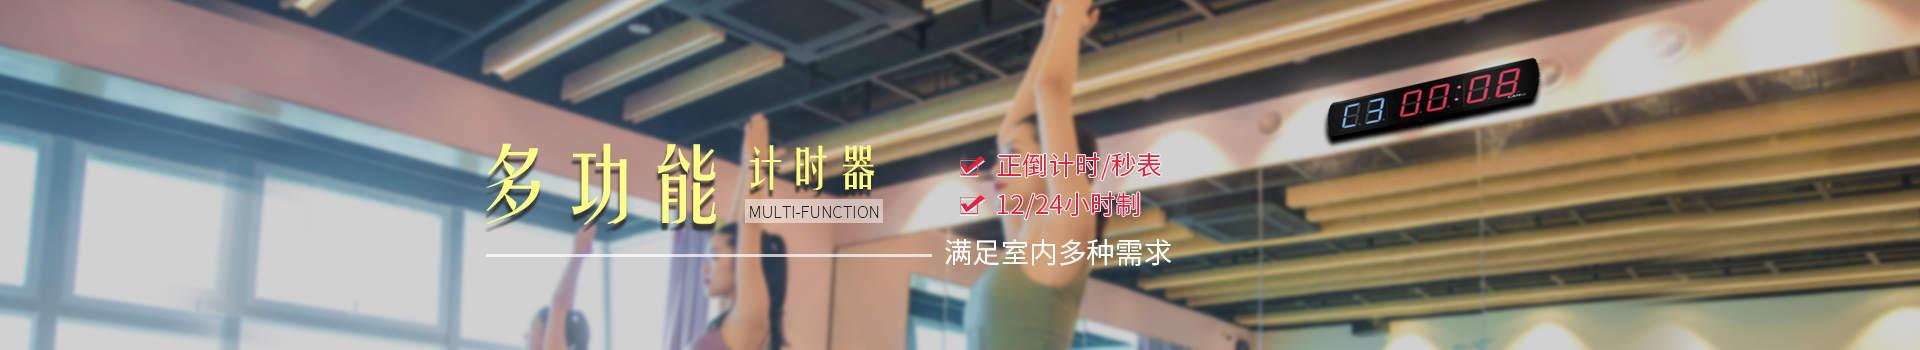 璧i��姝e��璁℃��/绉�琛ㄨ�℃�跺��锛�12/24灏��跺�讹�婊¤冻瀹ゅ��澶�绉��烘����姹�